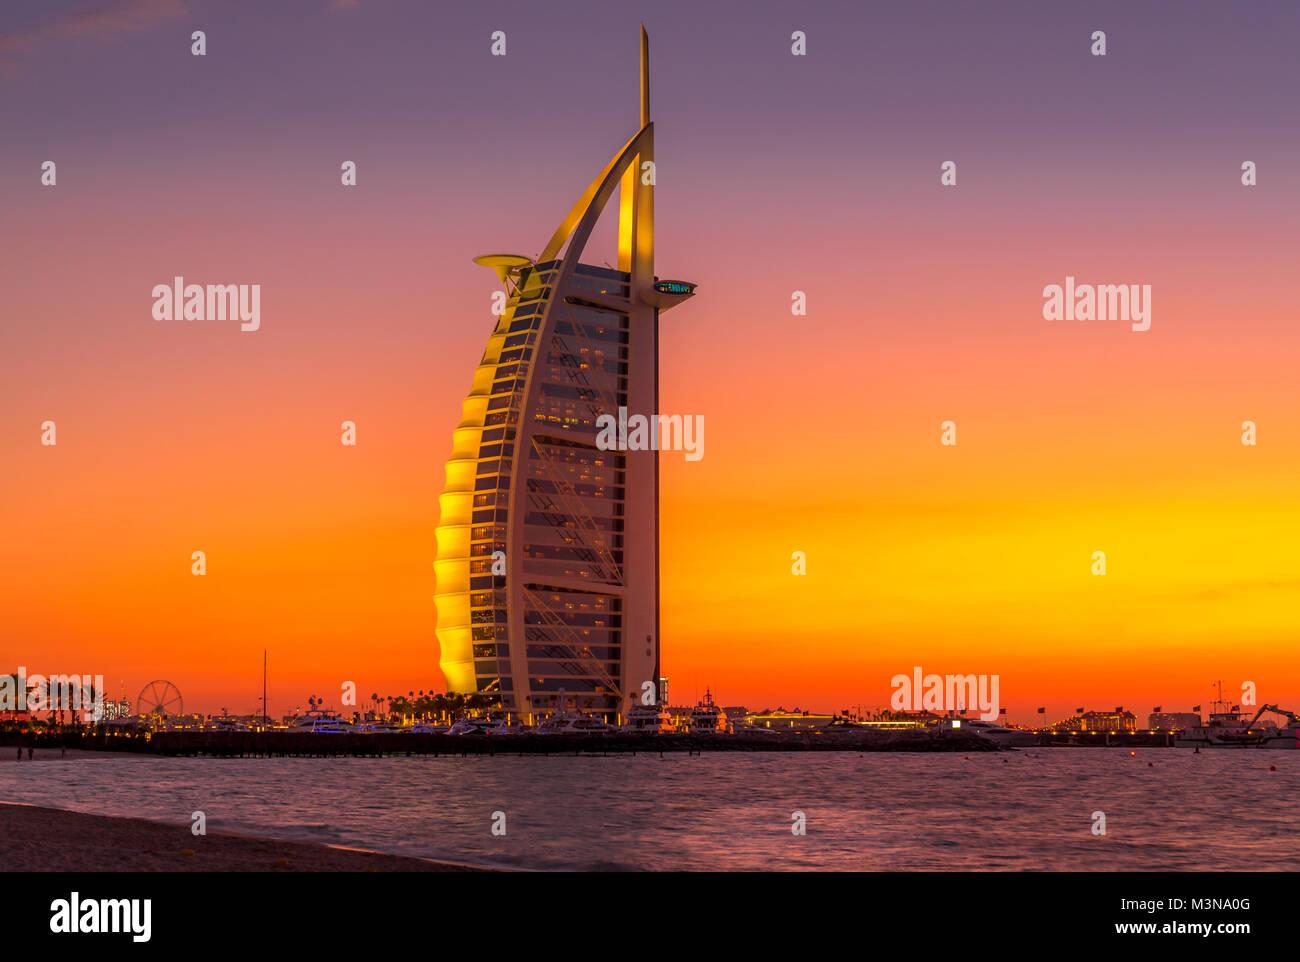 Sunset view of Burj Al Arab hotel on Jumeirah beach in Dubai, United Arab Emirates - Stock Image